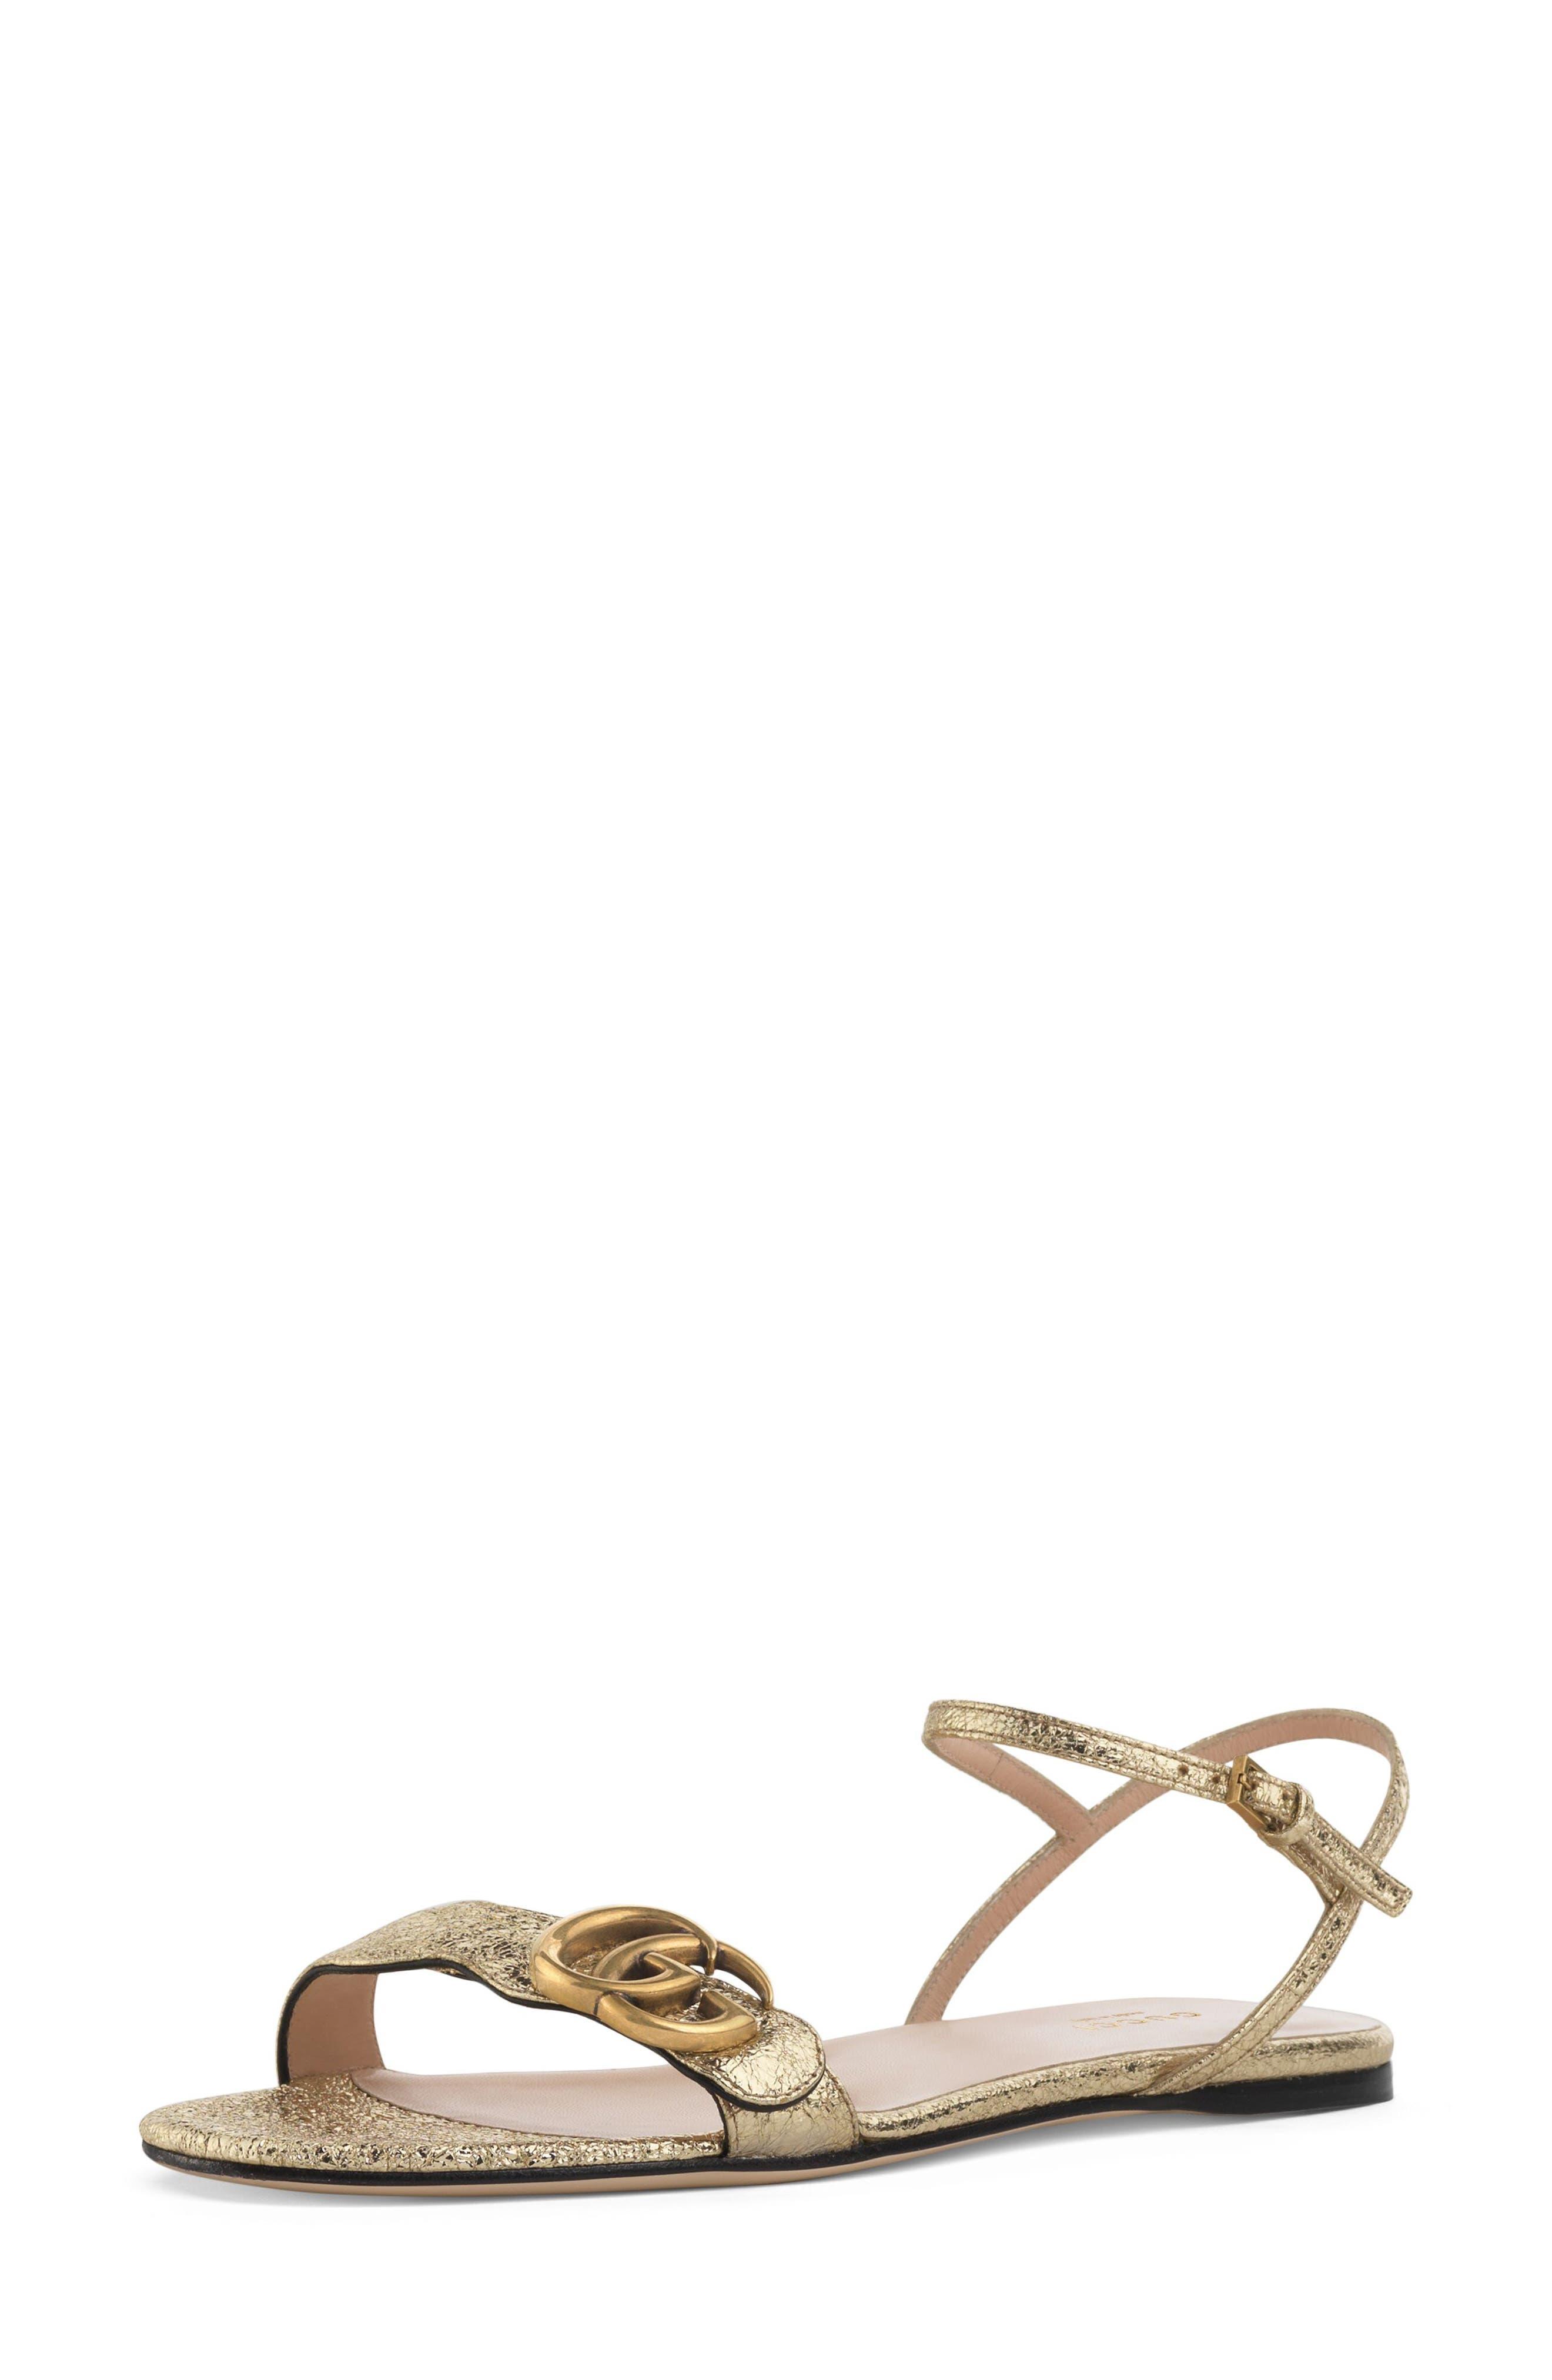 Marmont Quarter Strap Flat Sandal,                         Main,                         color, PLATINO